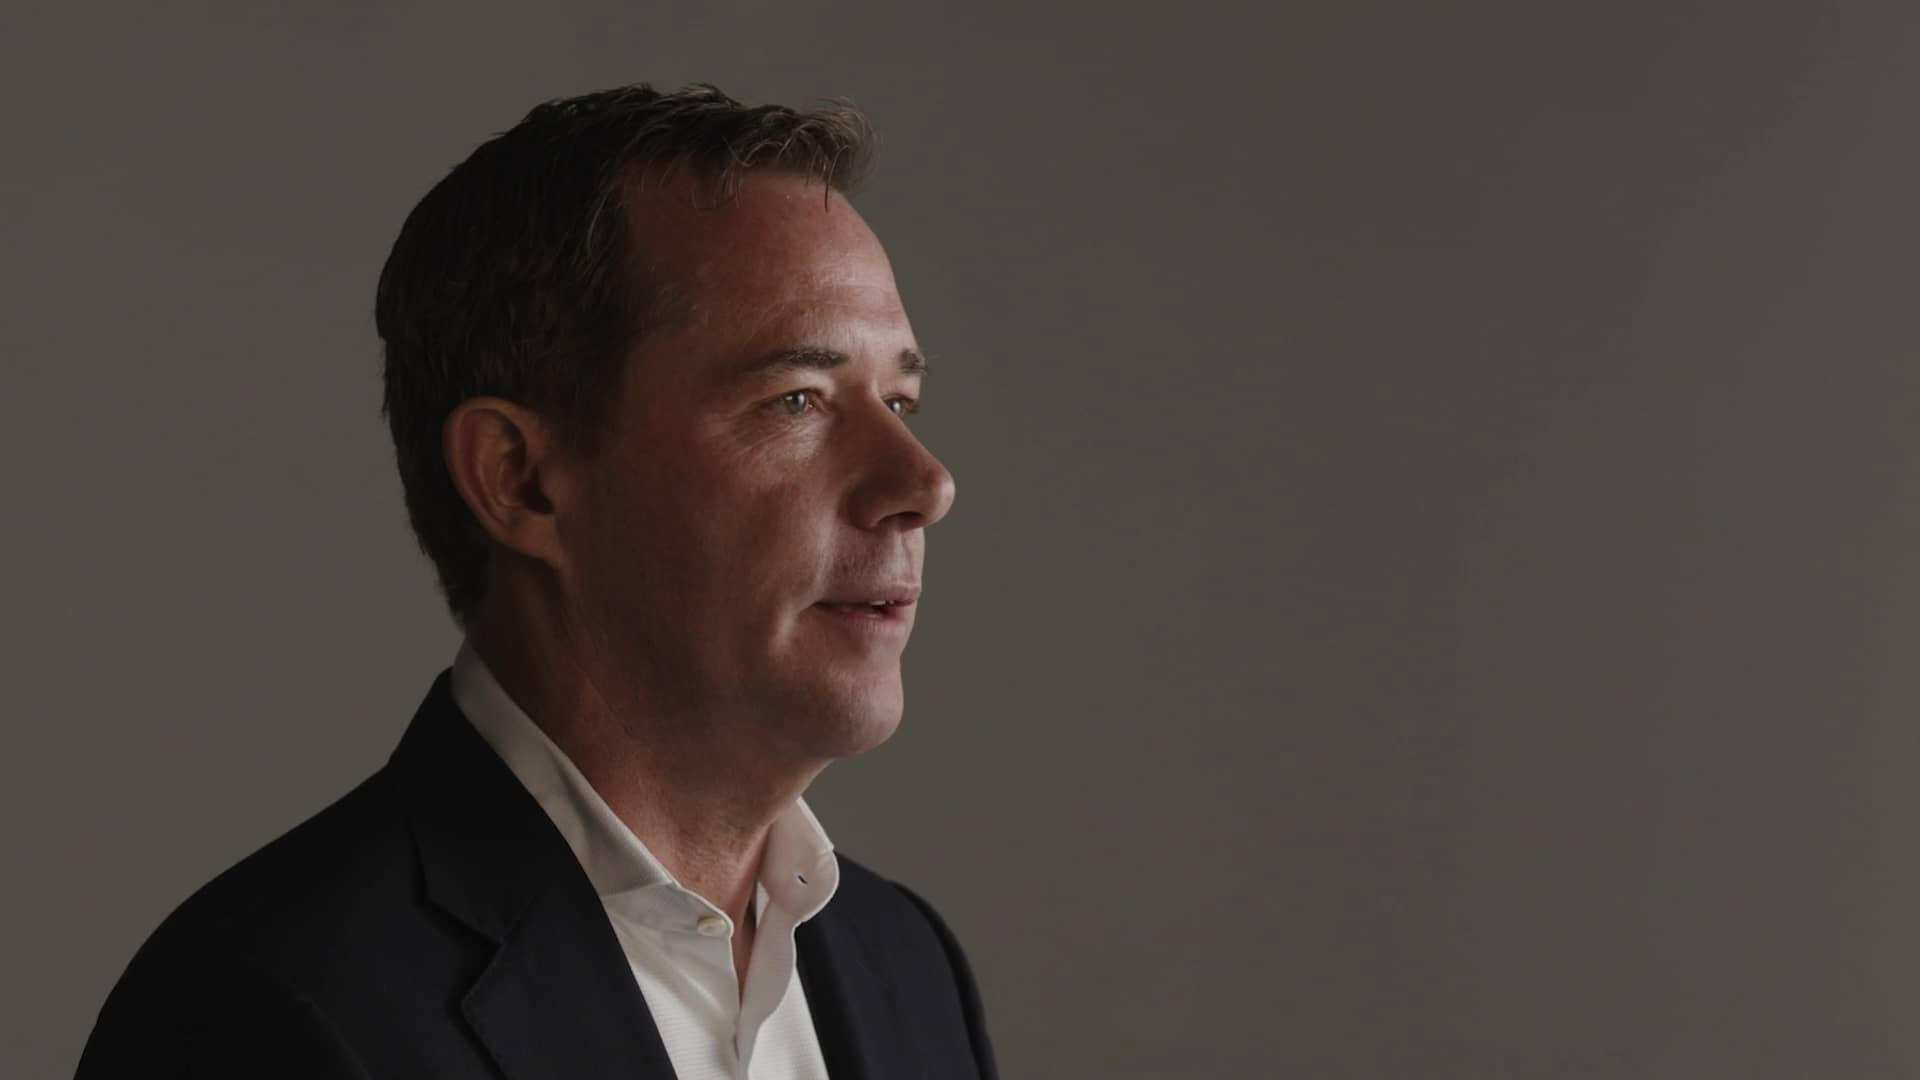 Oyster Chief Executive, Mark Schiele